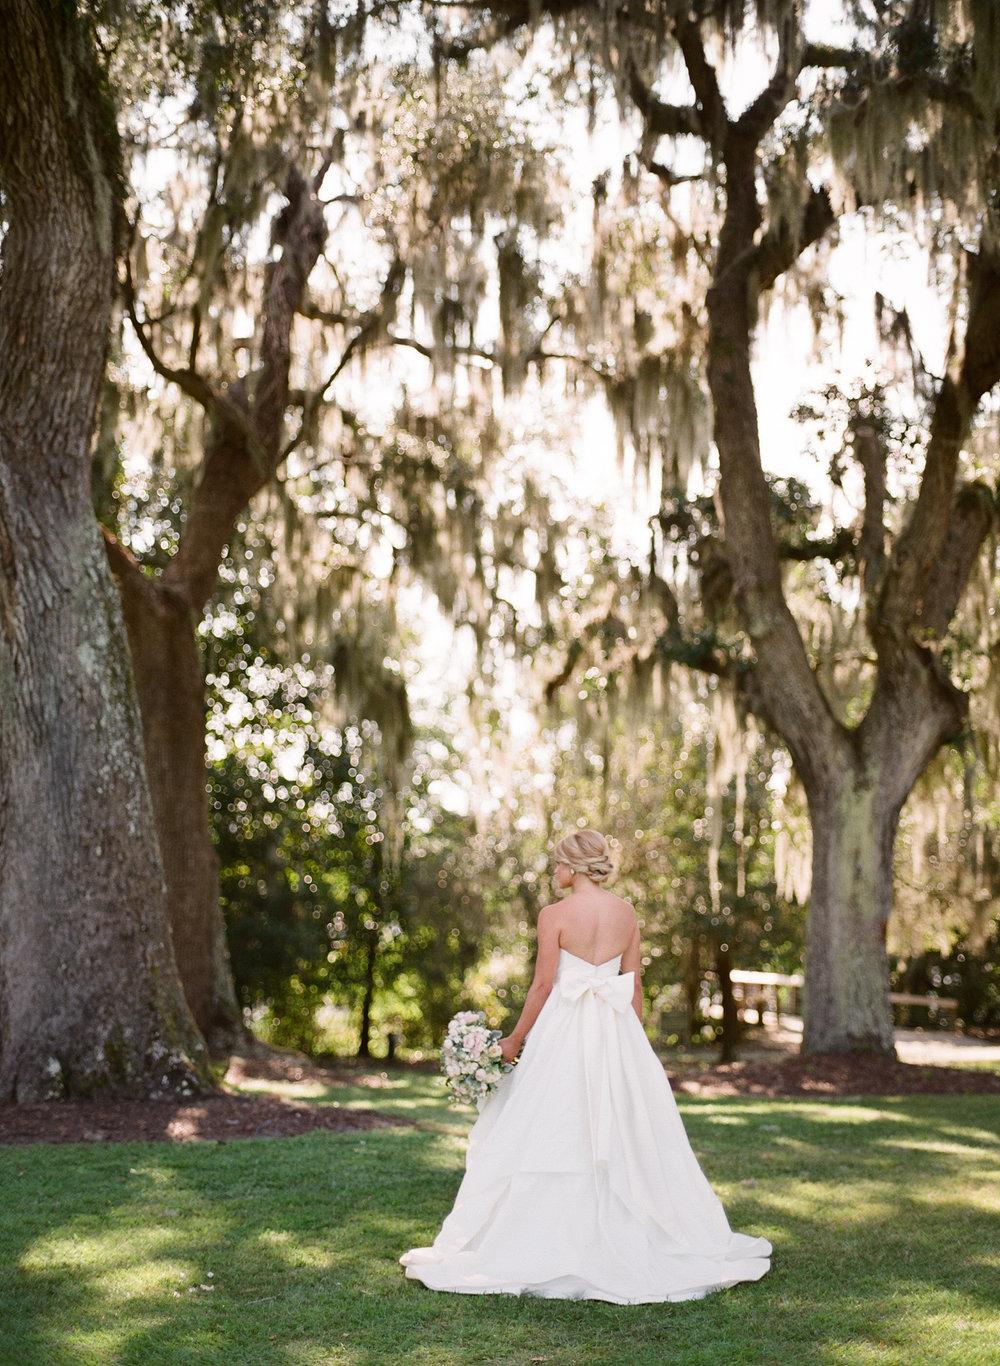 Airlie-Gardens-Wedding-21.jpg